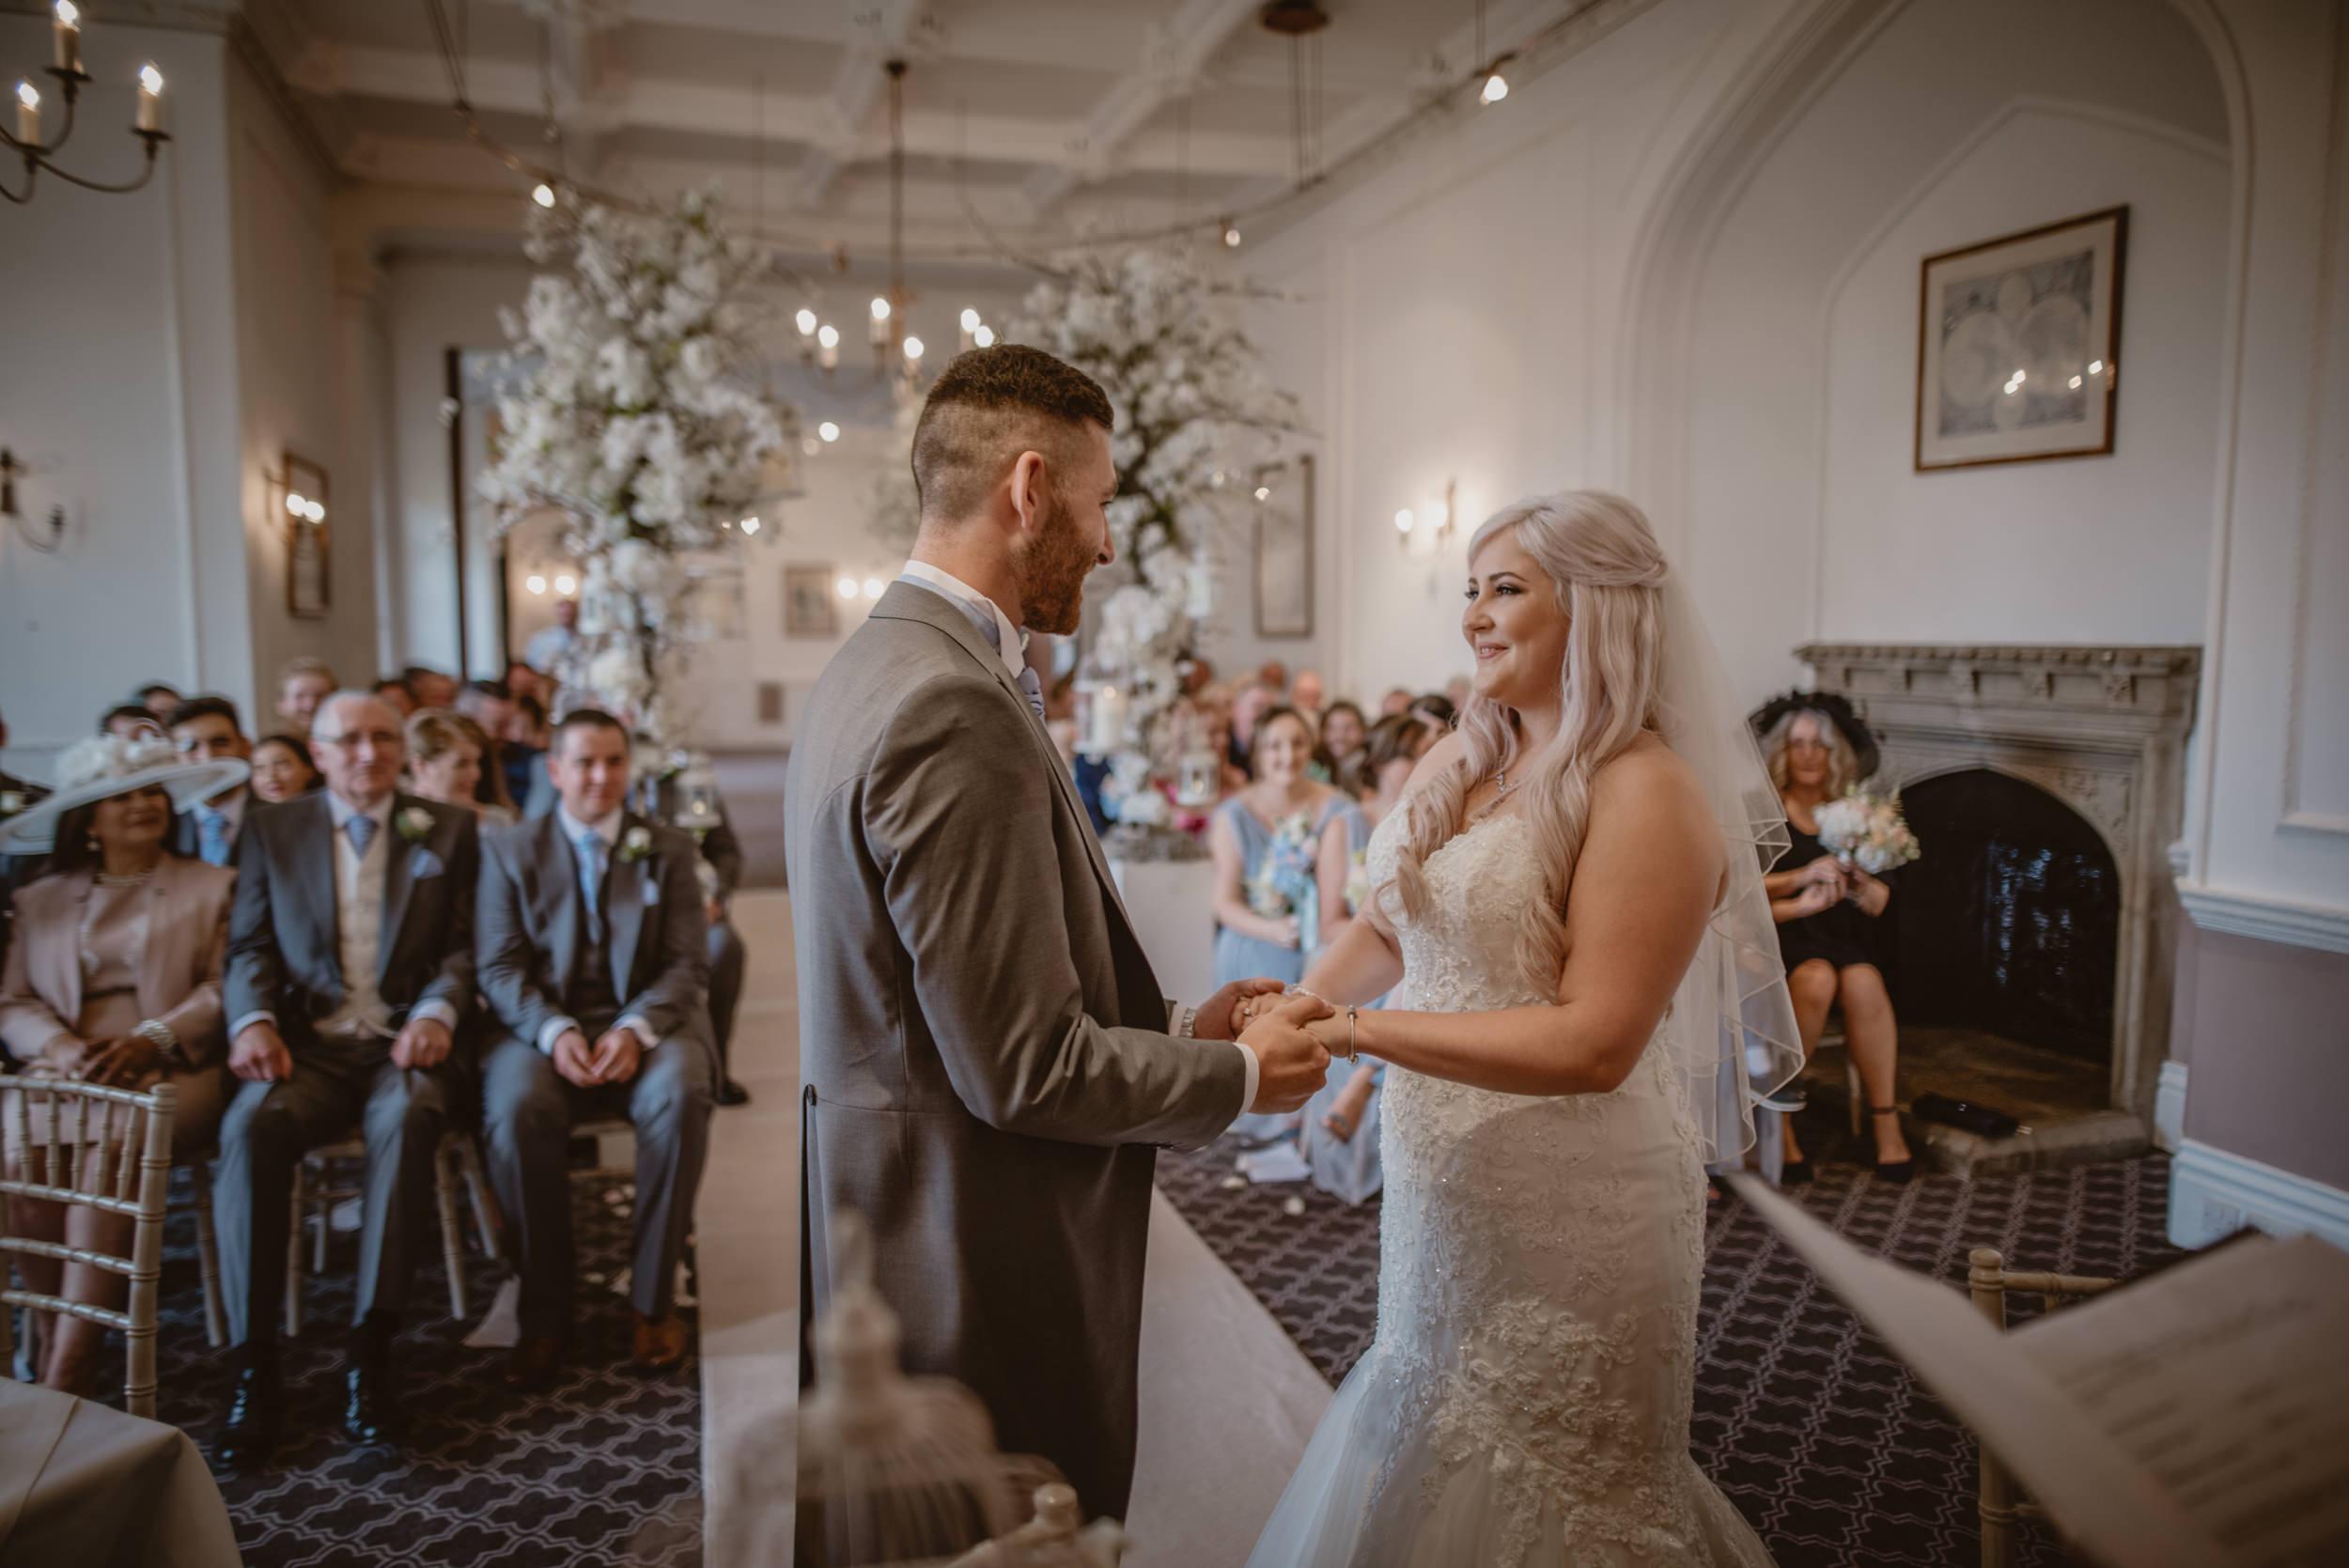 Rachel-and-James-Wedding-Horsley-Towers-State-Manu-Mendoza-Wedding-Photography-252.jpg